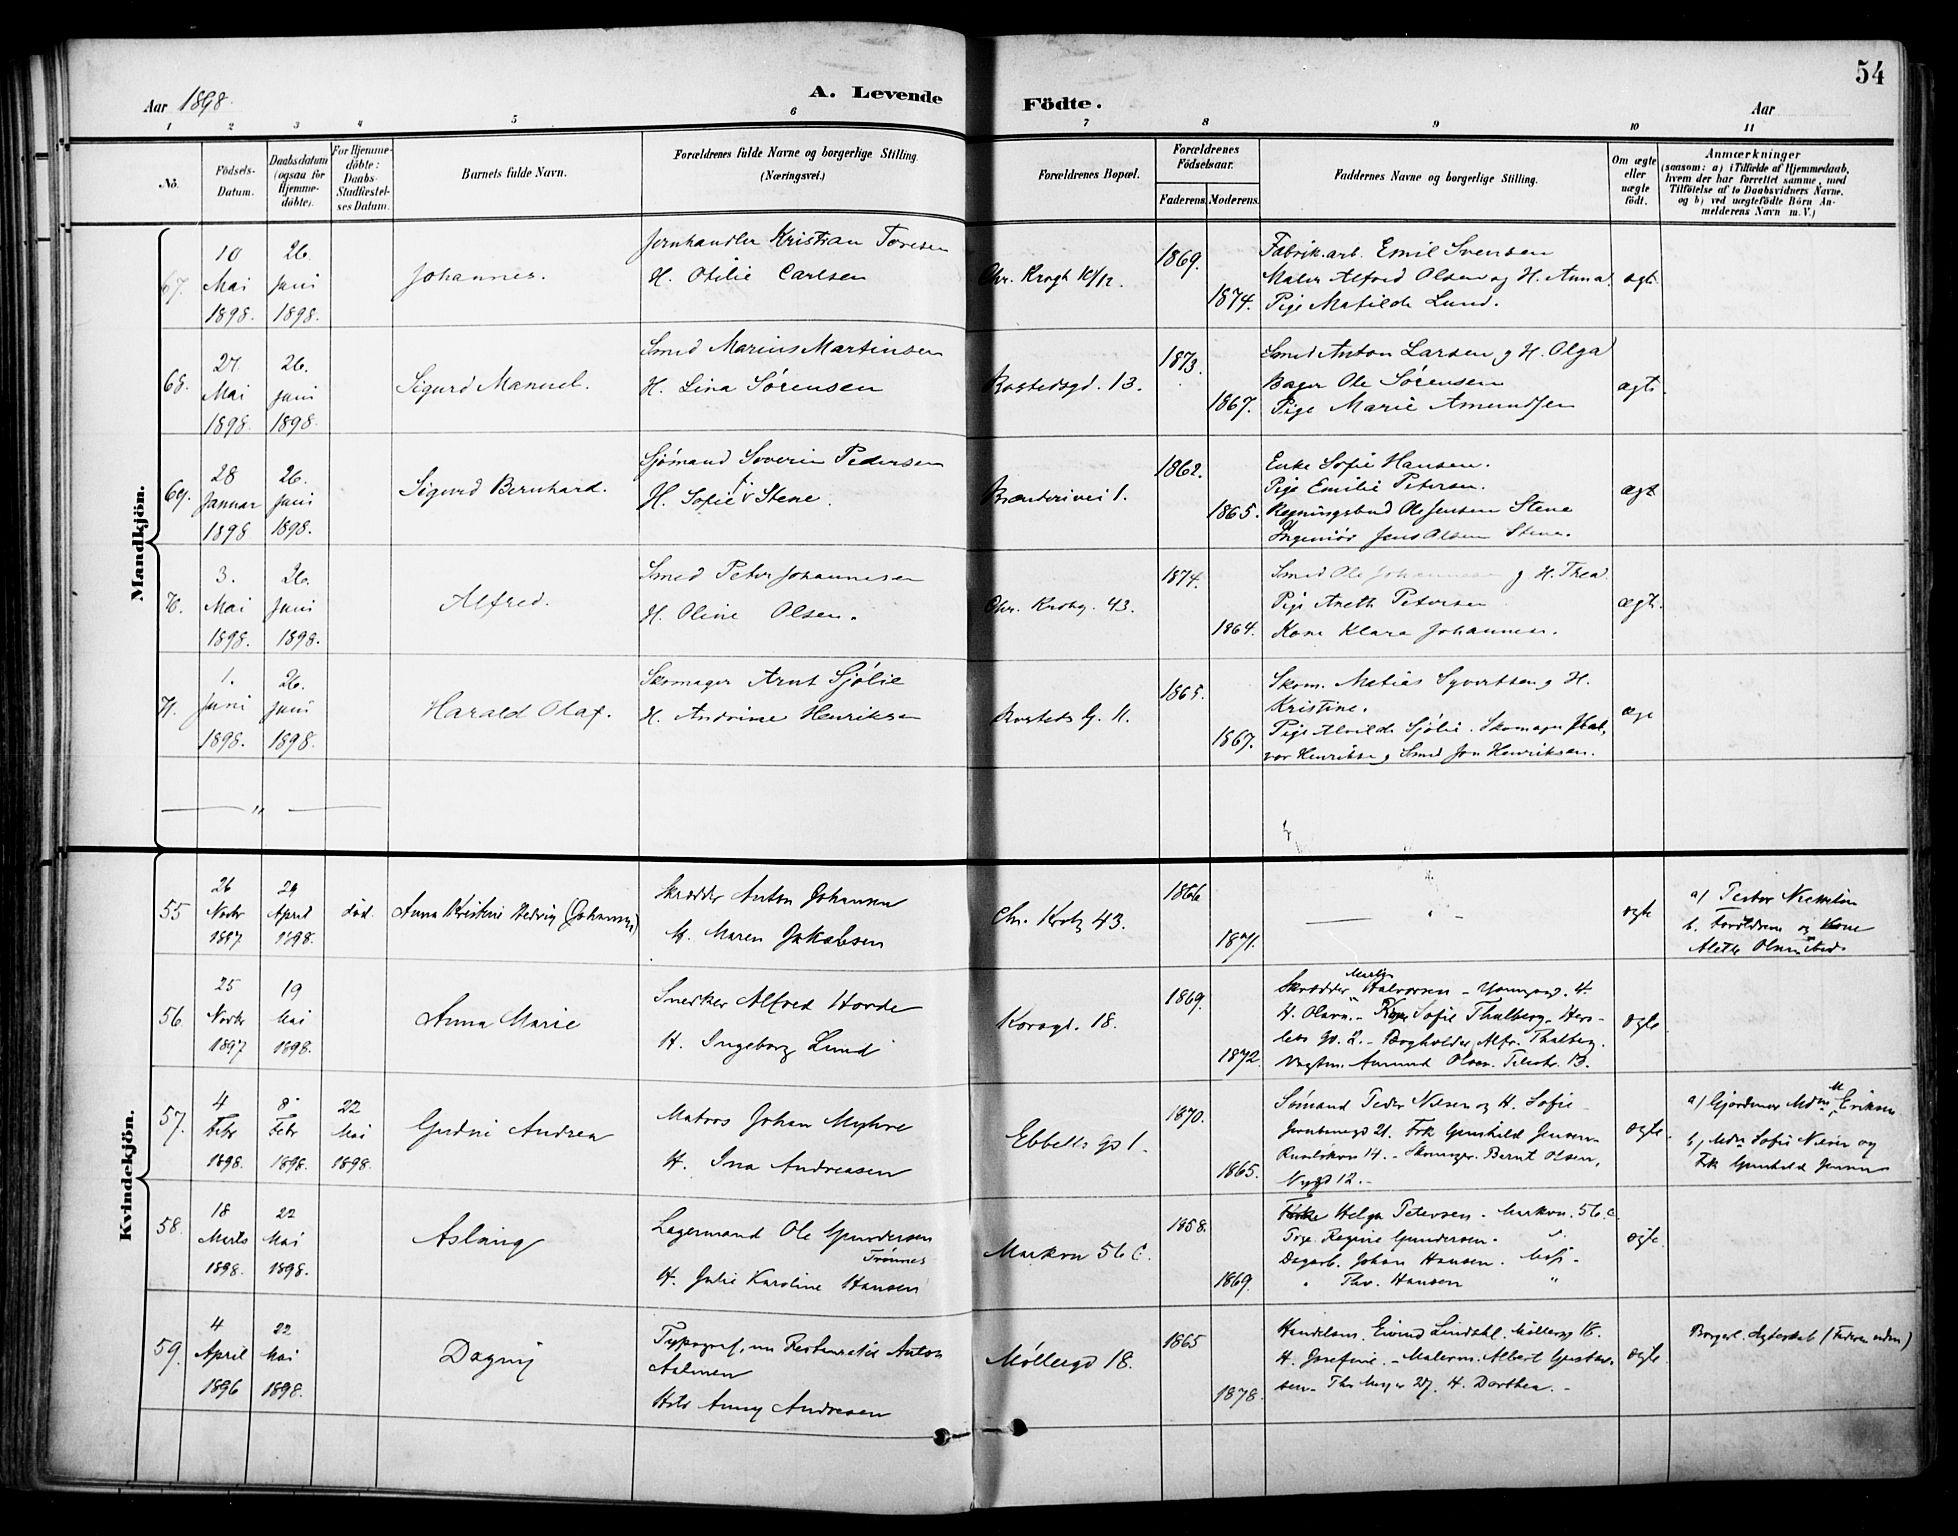 SAO, Jakob prestekontor Kirkebøker, F/Fa/L0005: Parish register (official) no. 5, 1896-1903, p. 54